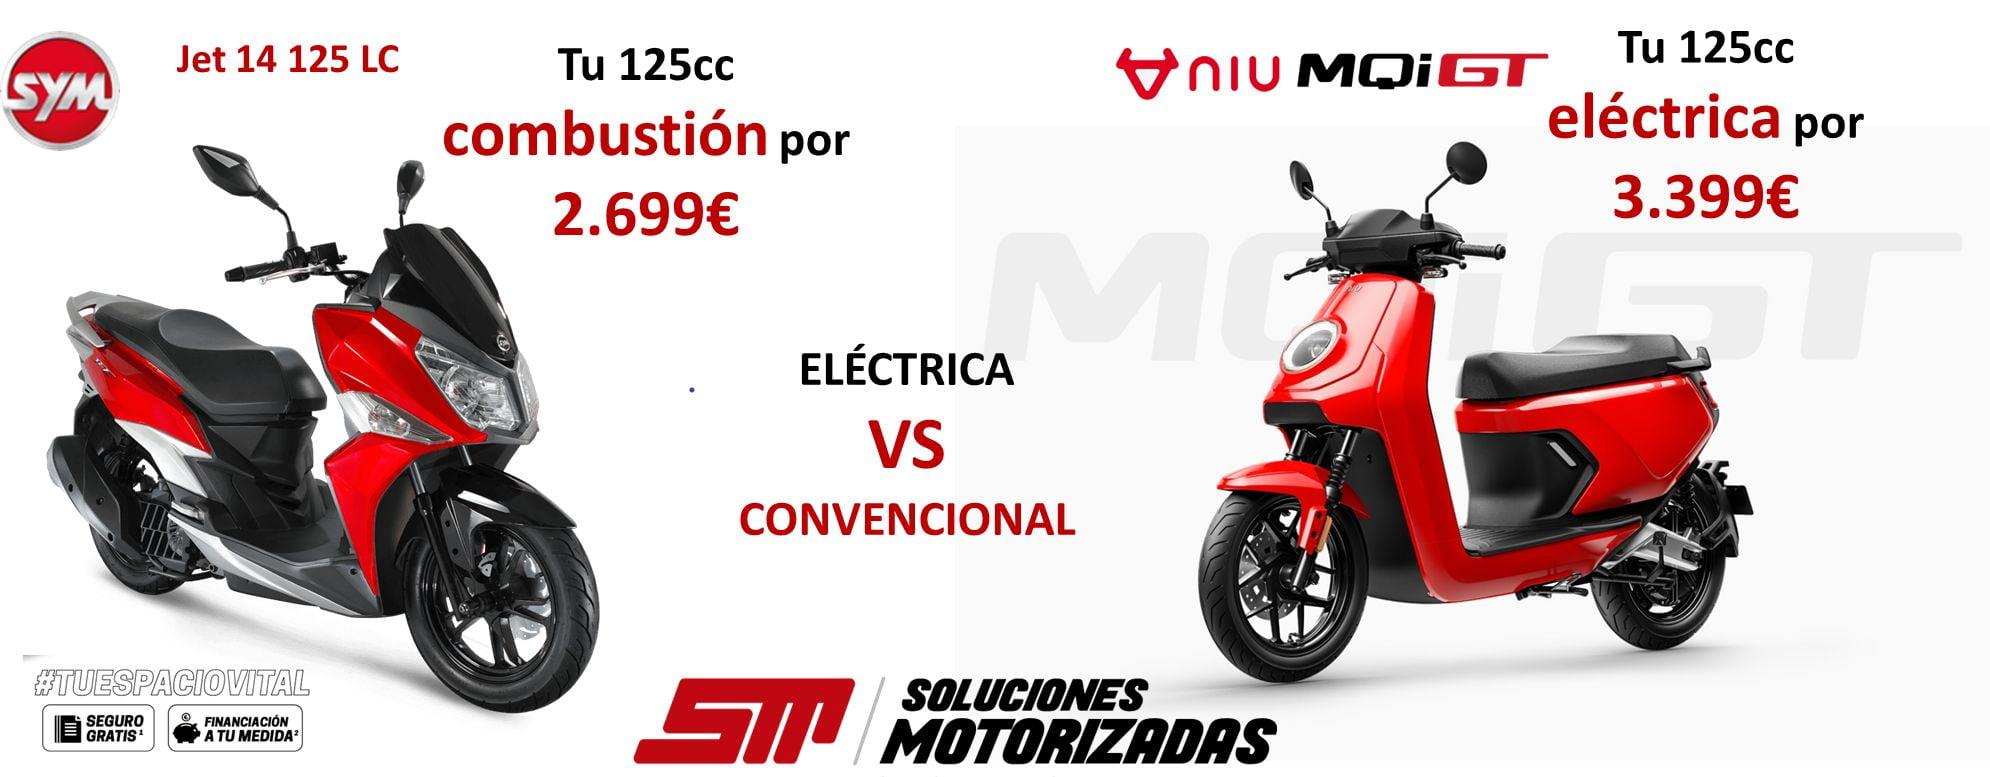 comprar moto eléctrica